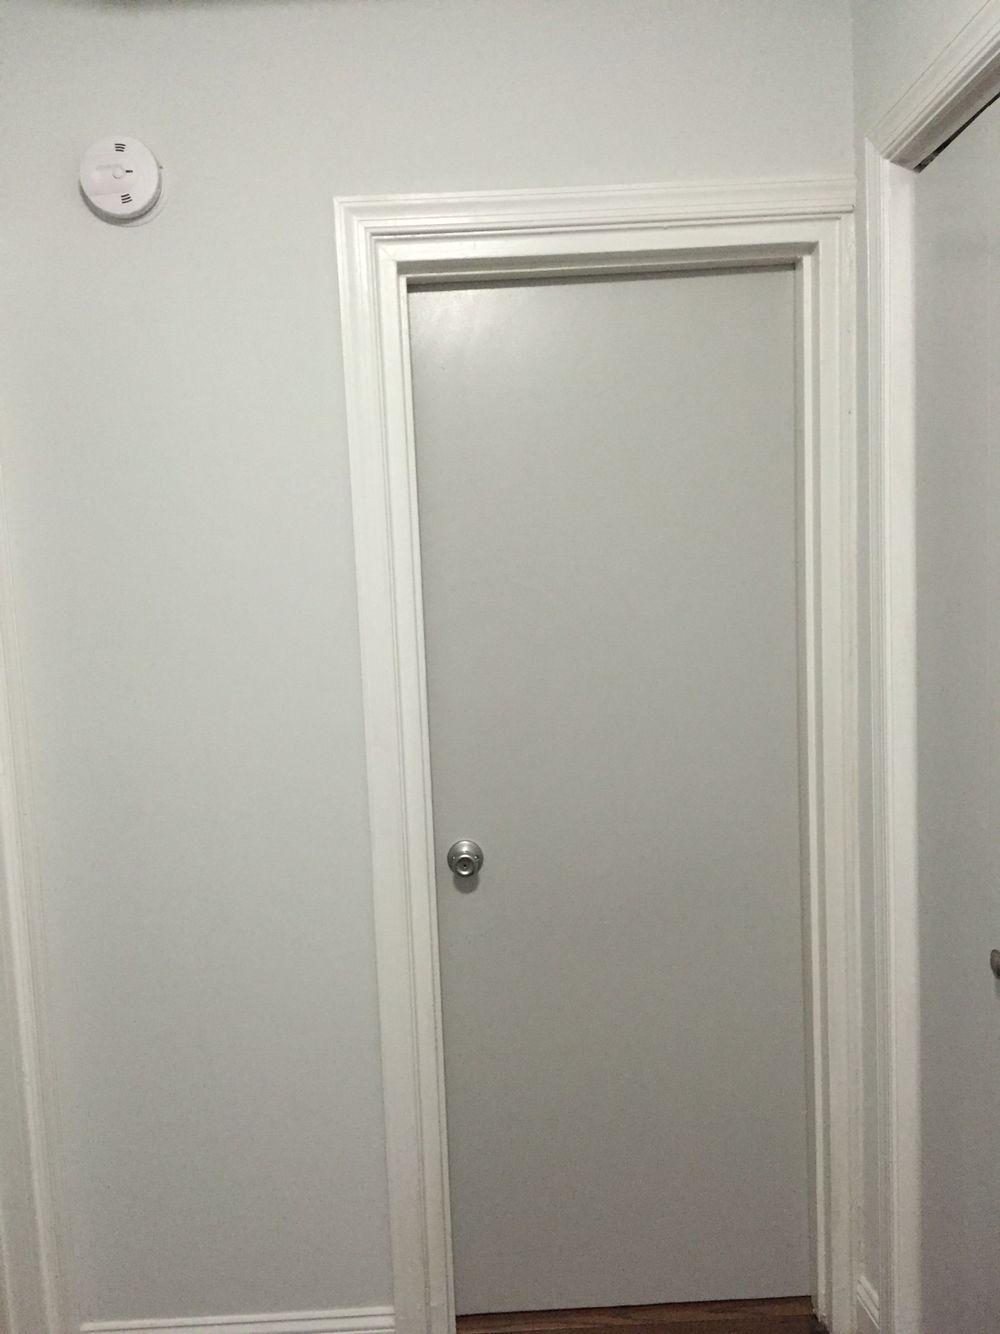 Wall Sherwin Williams Nebulous White Door Sherwin